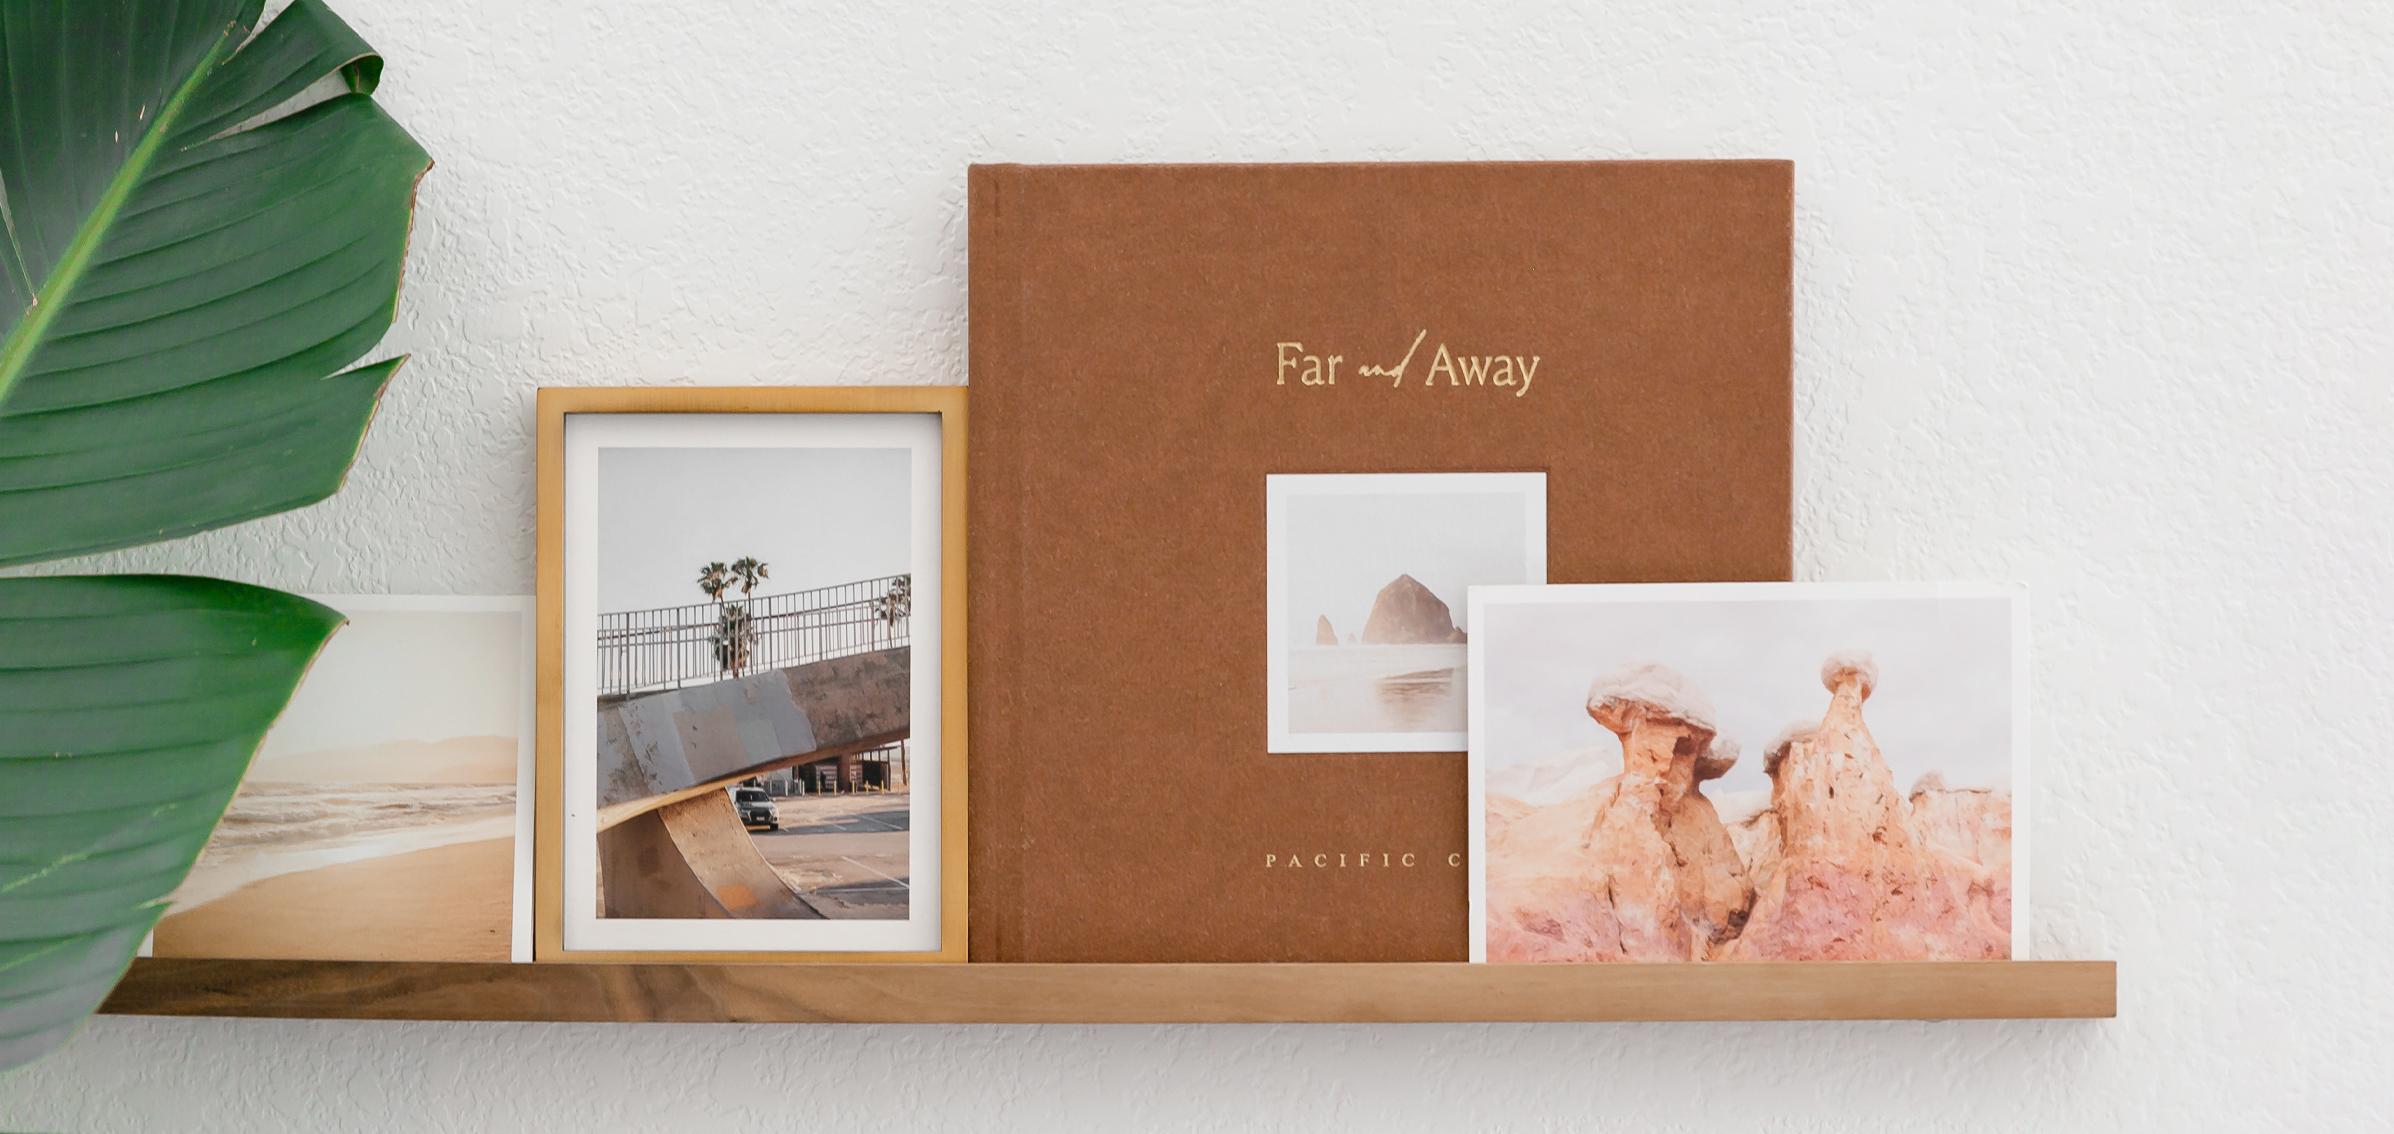 Artifact Uprising photo projects on wooden photo ledge